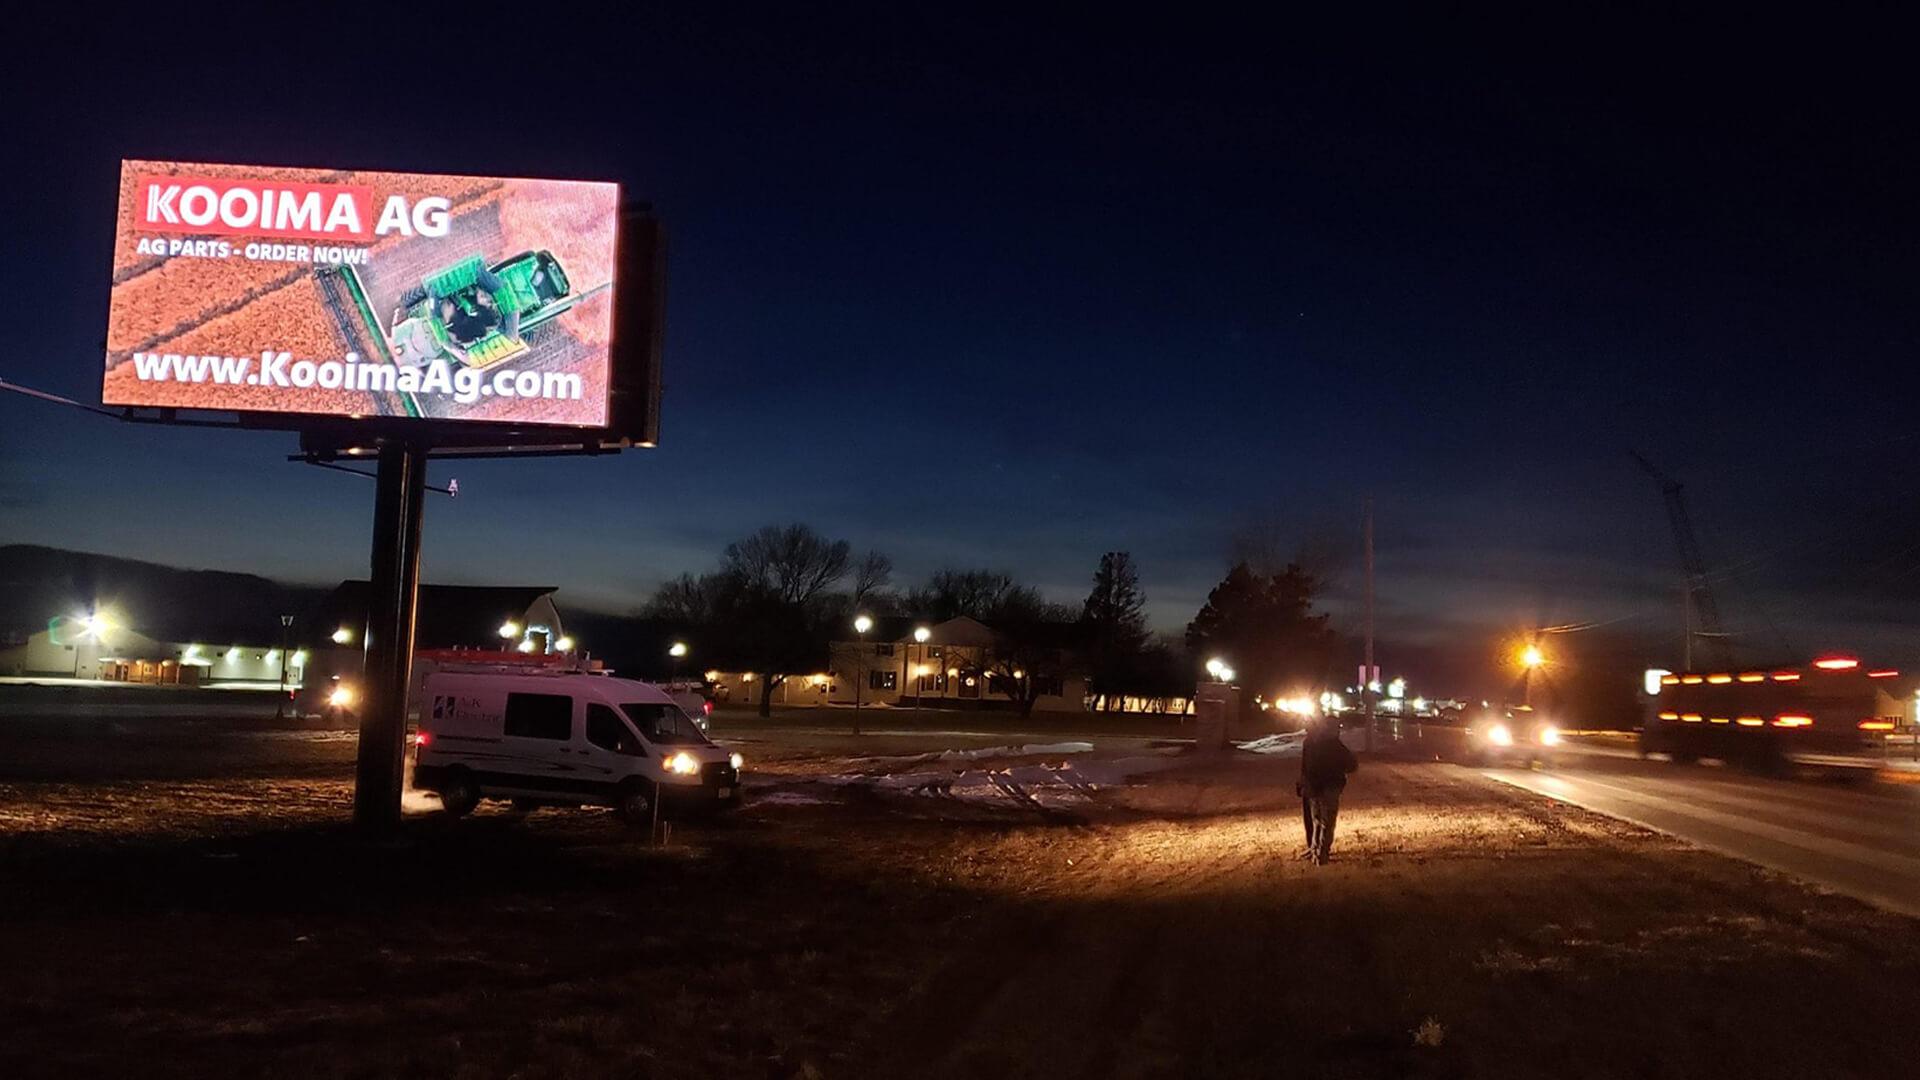 Canton, South Dakota - 11' x 22' Double Sided Billboard